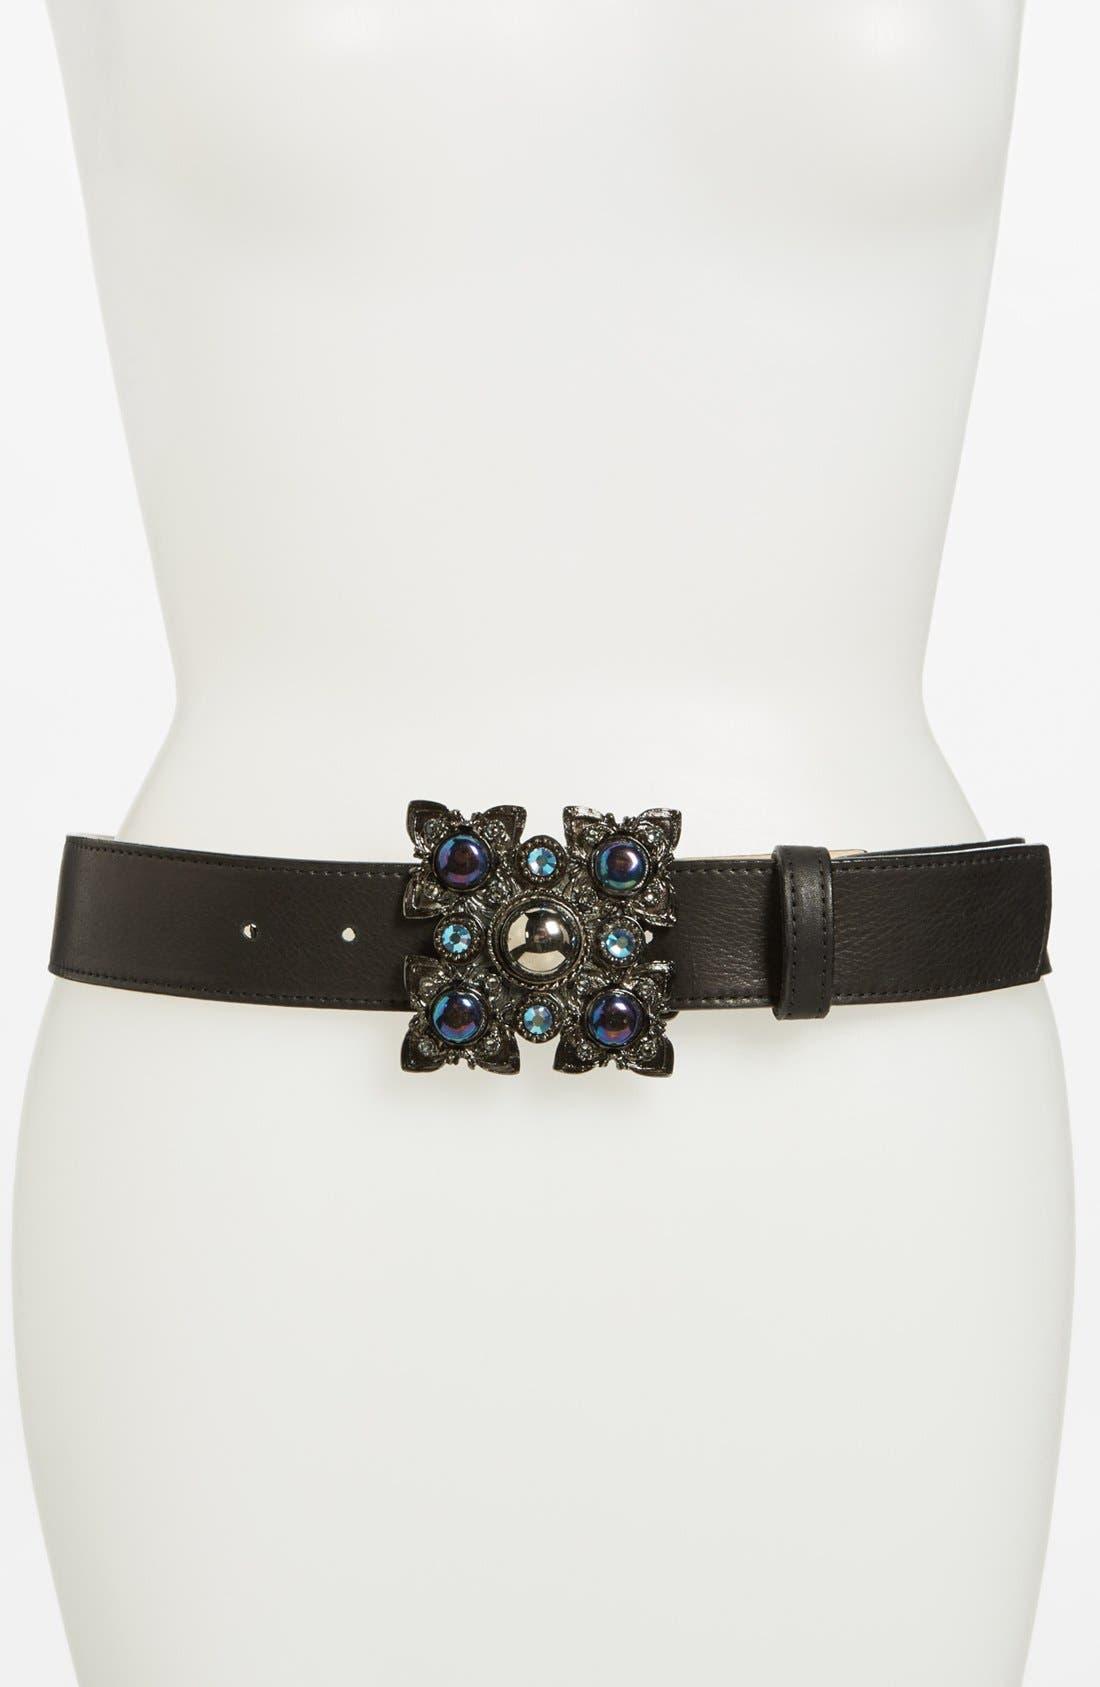 Alternate Image 1 Selected - Leatherock Leather Belt